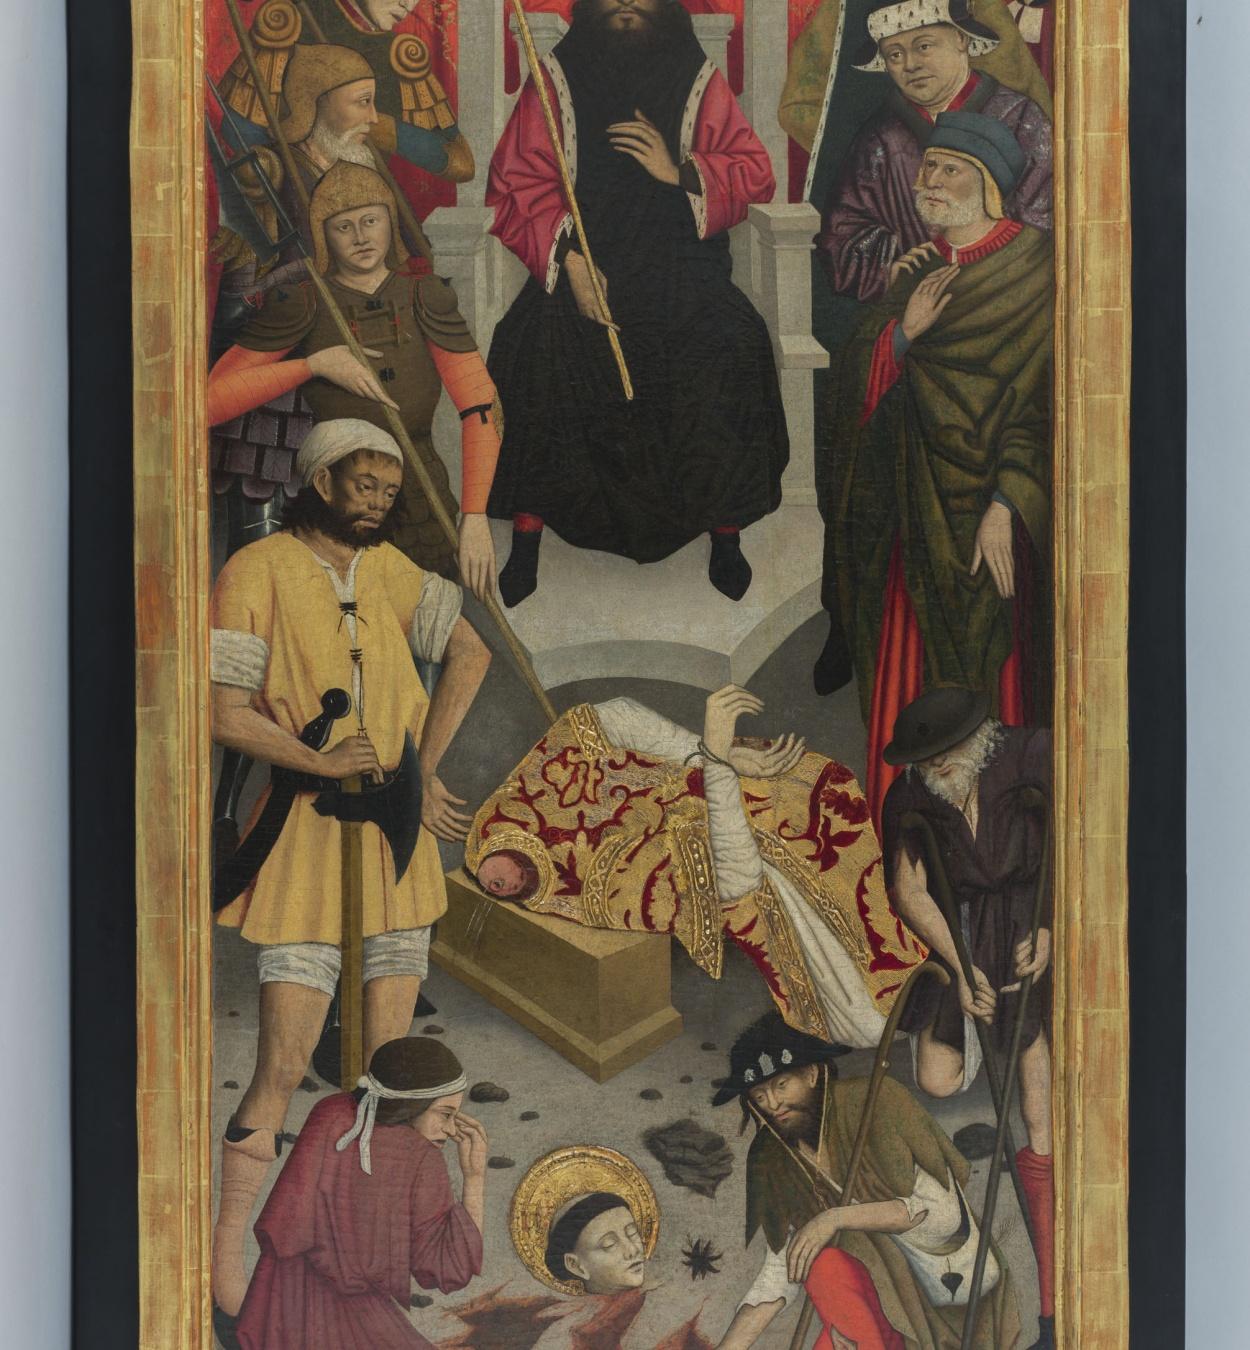 Lluís Dalmau - The Beheading of Saint Baudilus - circa 1448